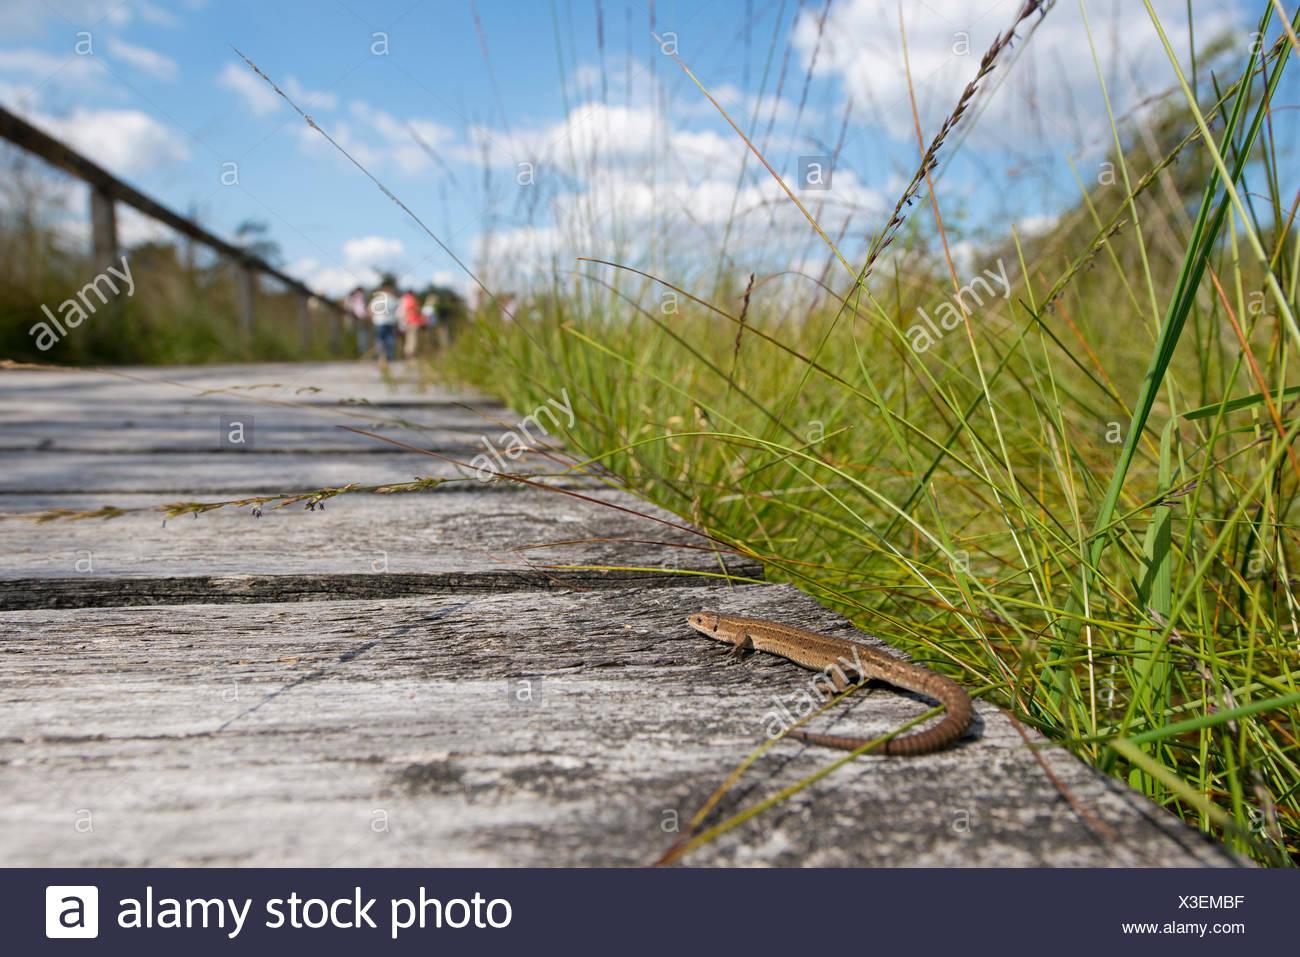 Viviparous lizard (Zootoca vivipara) basking on a boardwalk, Pietzmoor moor, Lüneburg Heath Nature Reserve, Schneverdingen - Stock Image